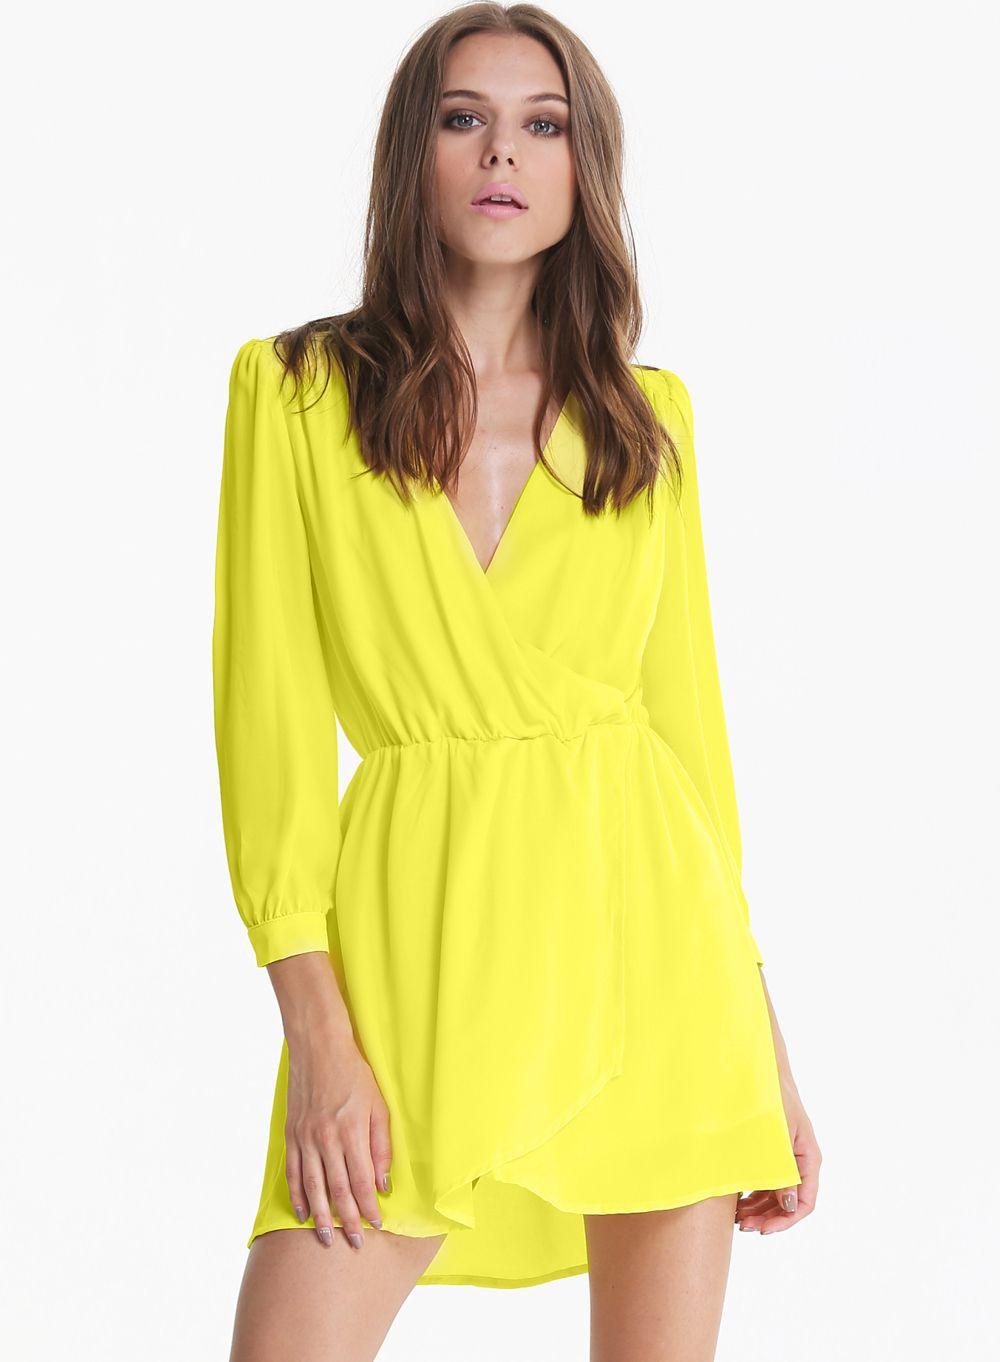 e0ee115e2 Vestido Neon Amarillo de manga larga de cuello V 16.99